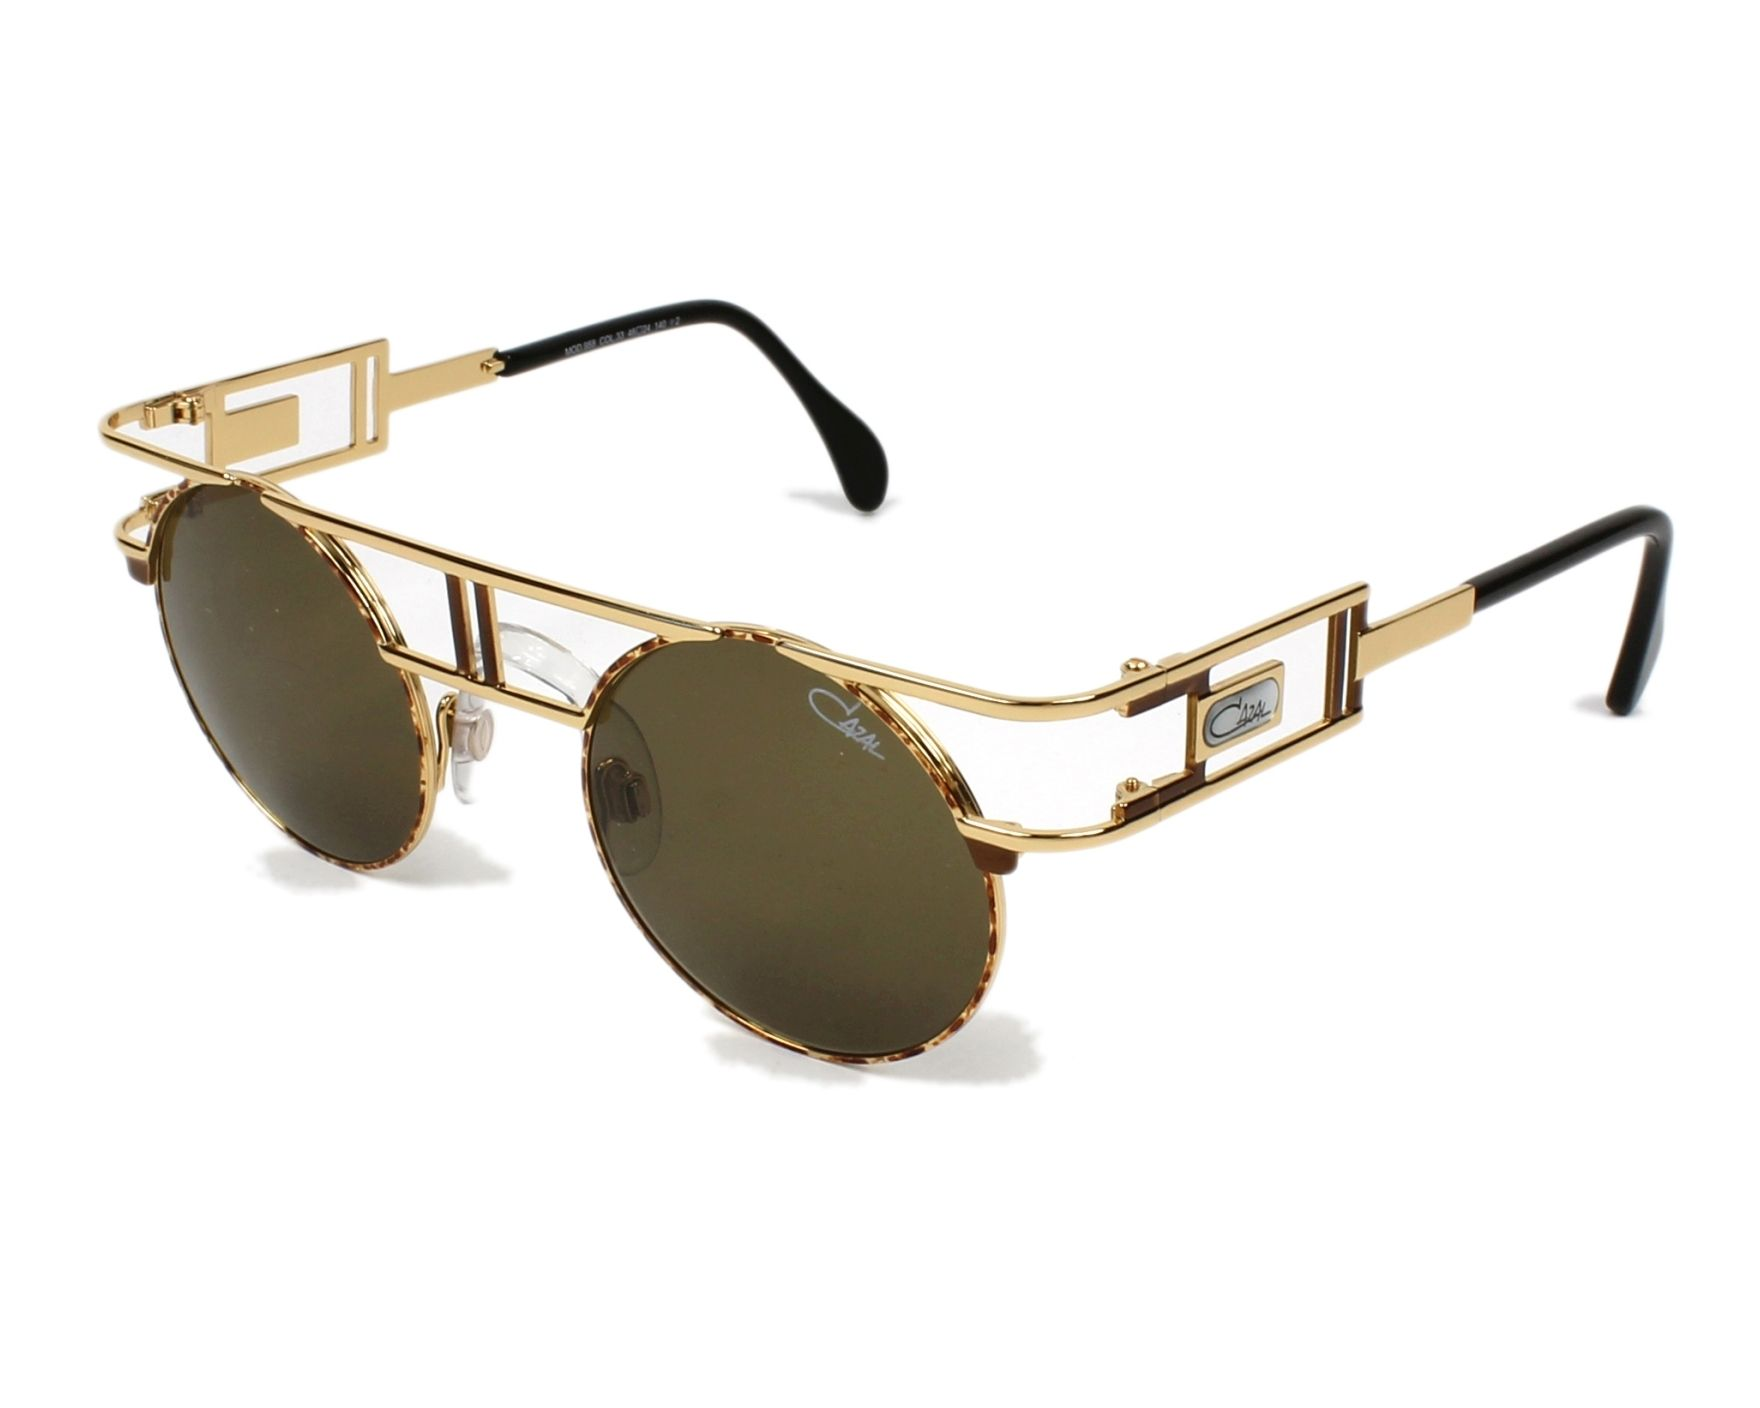 Cazal Sunglasses 958 033 Gold Visionet